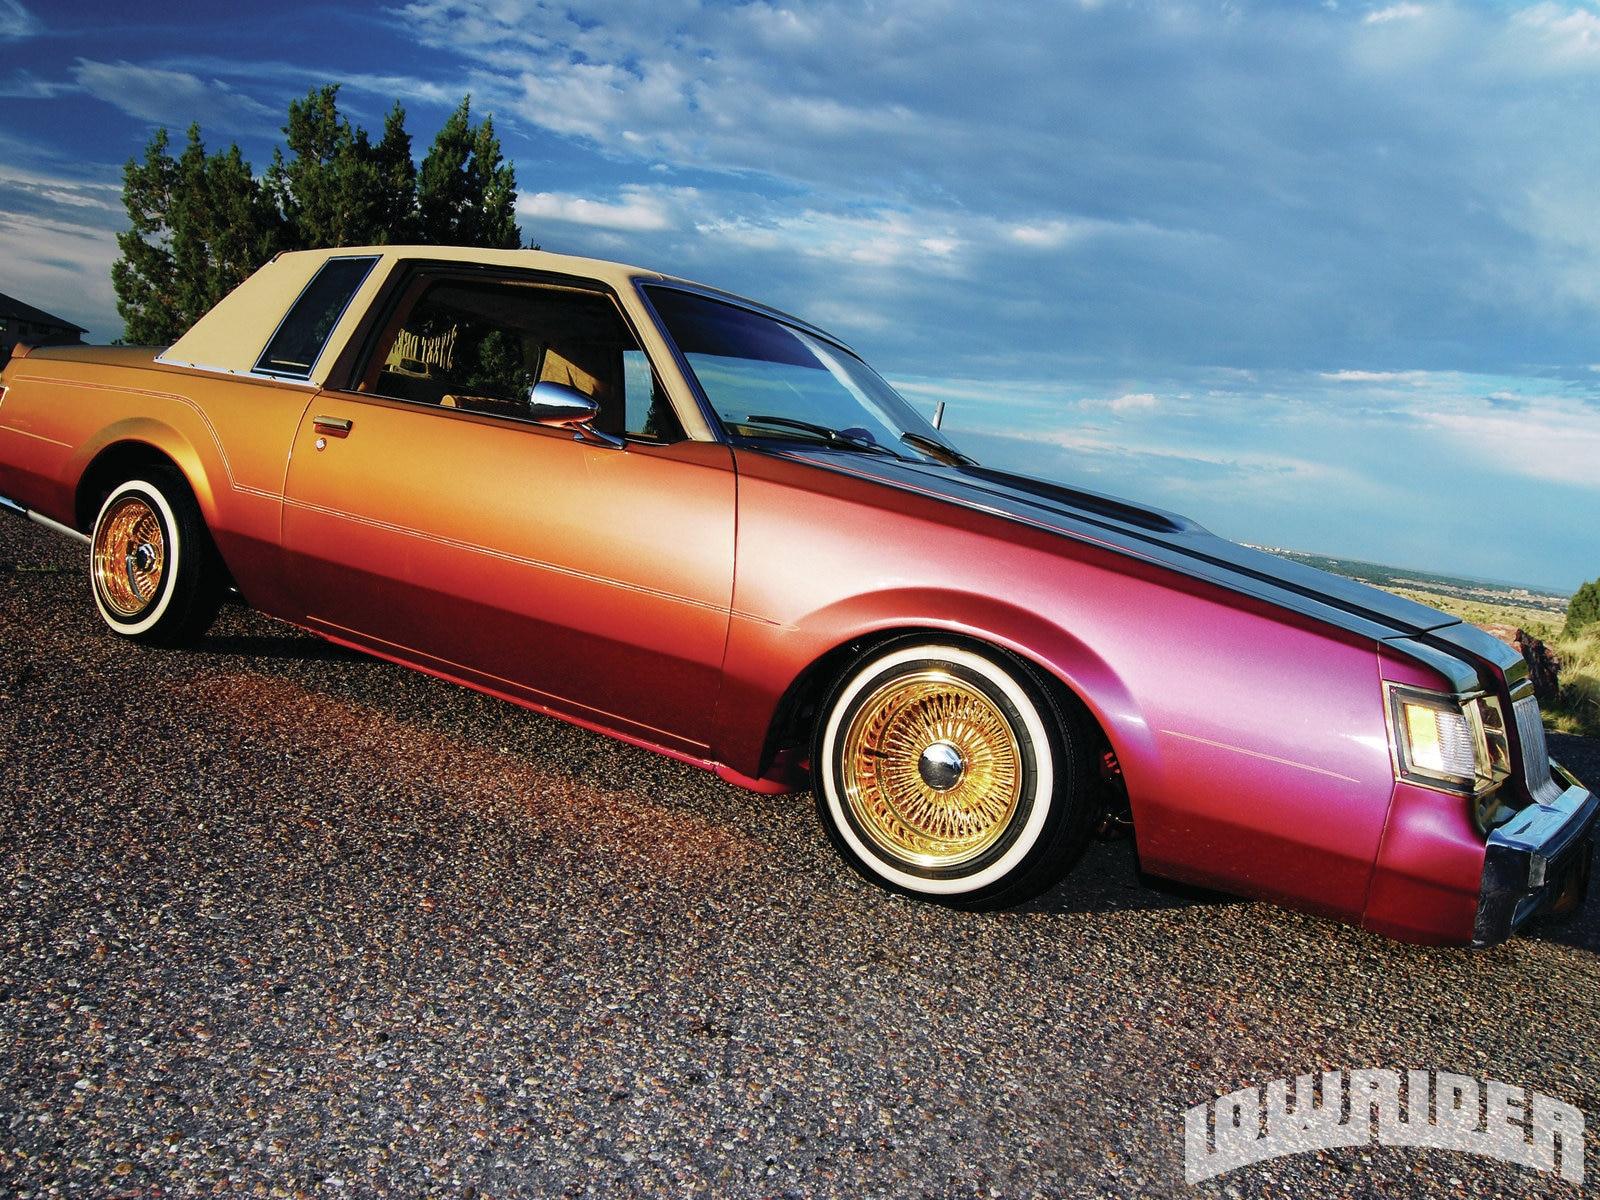 1984 Buick Regal - Lowrider Magazine